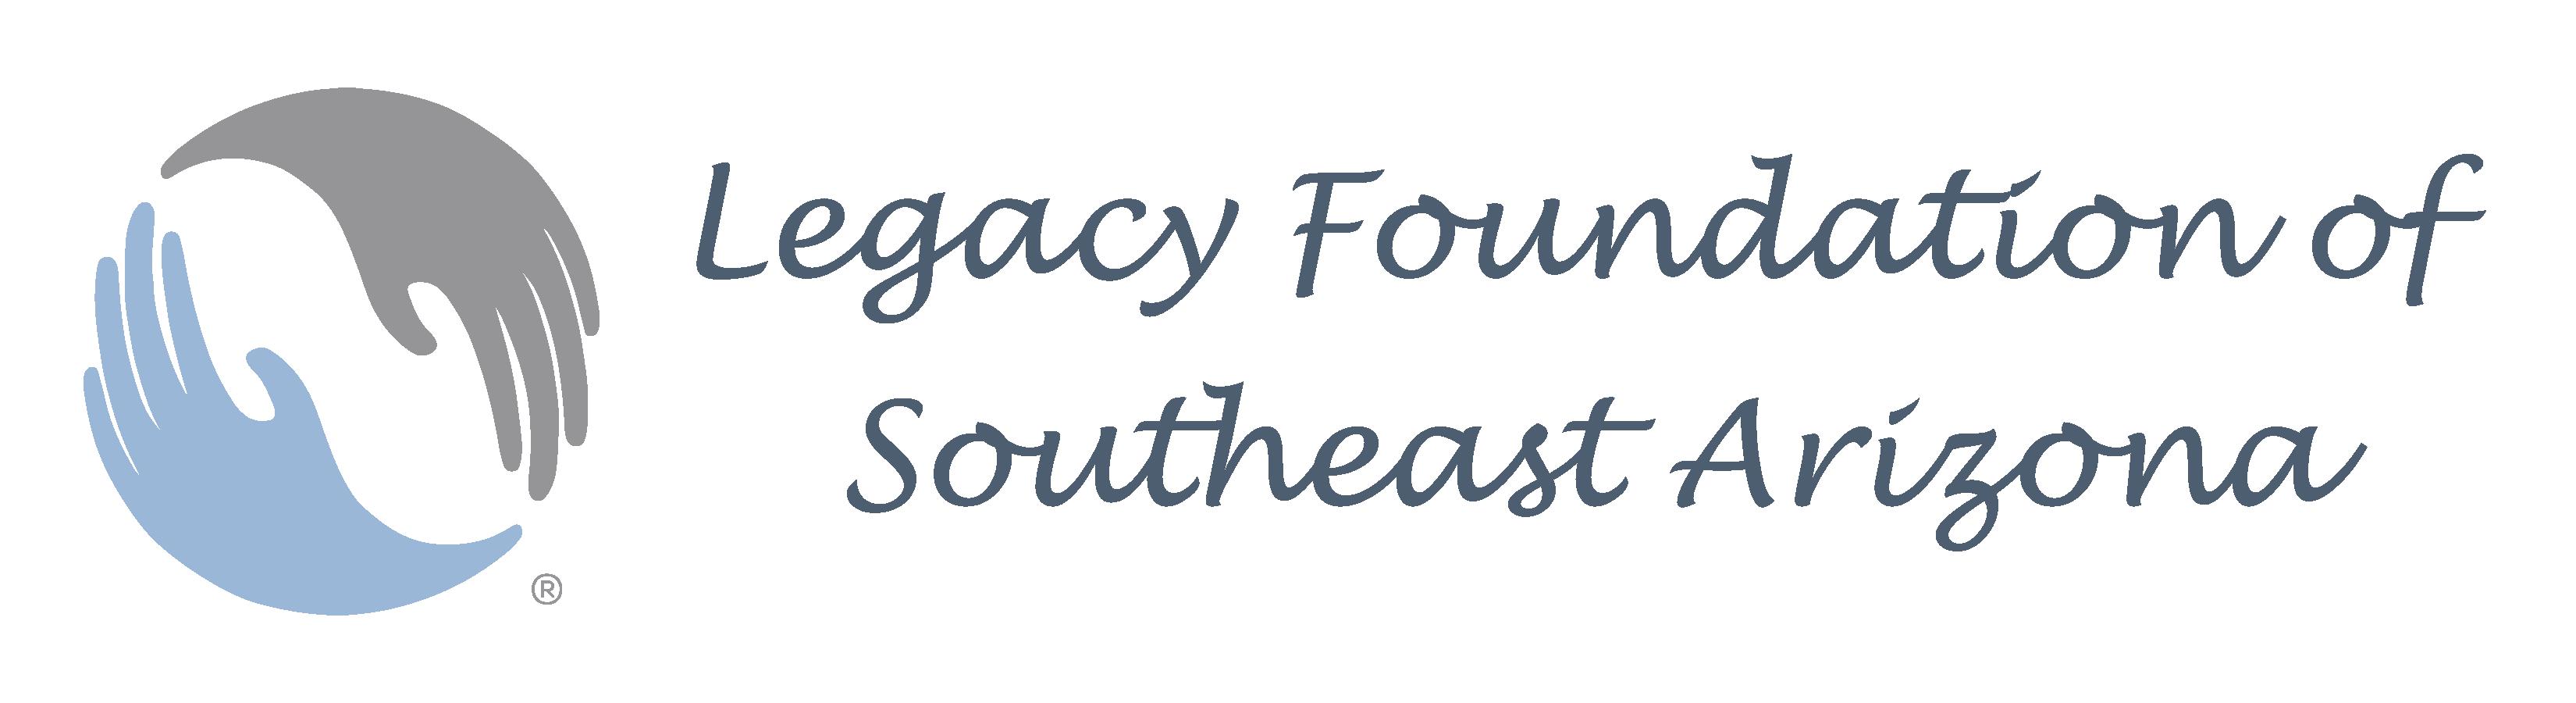 http://rootsandroads.org/wp-content/uploads/2021/01/Legacy-Logo-Suite-San-Serif-Darker-LUCIDA_Linear-3.png